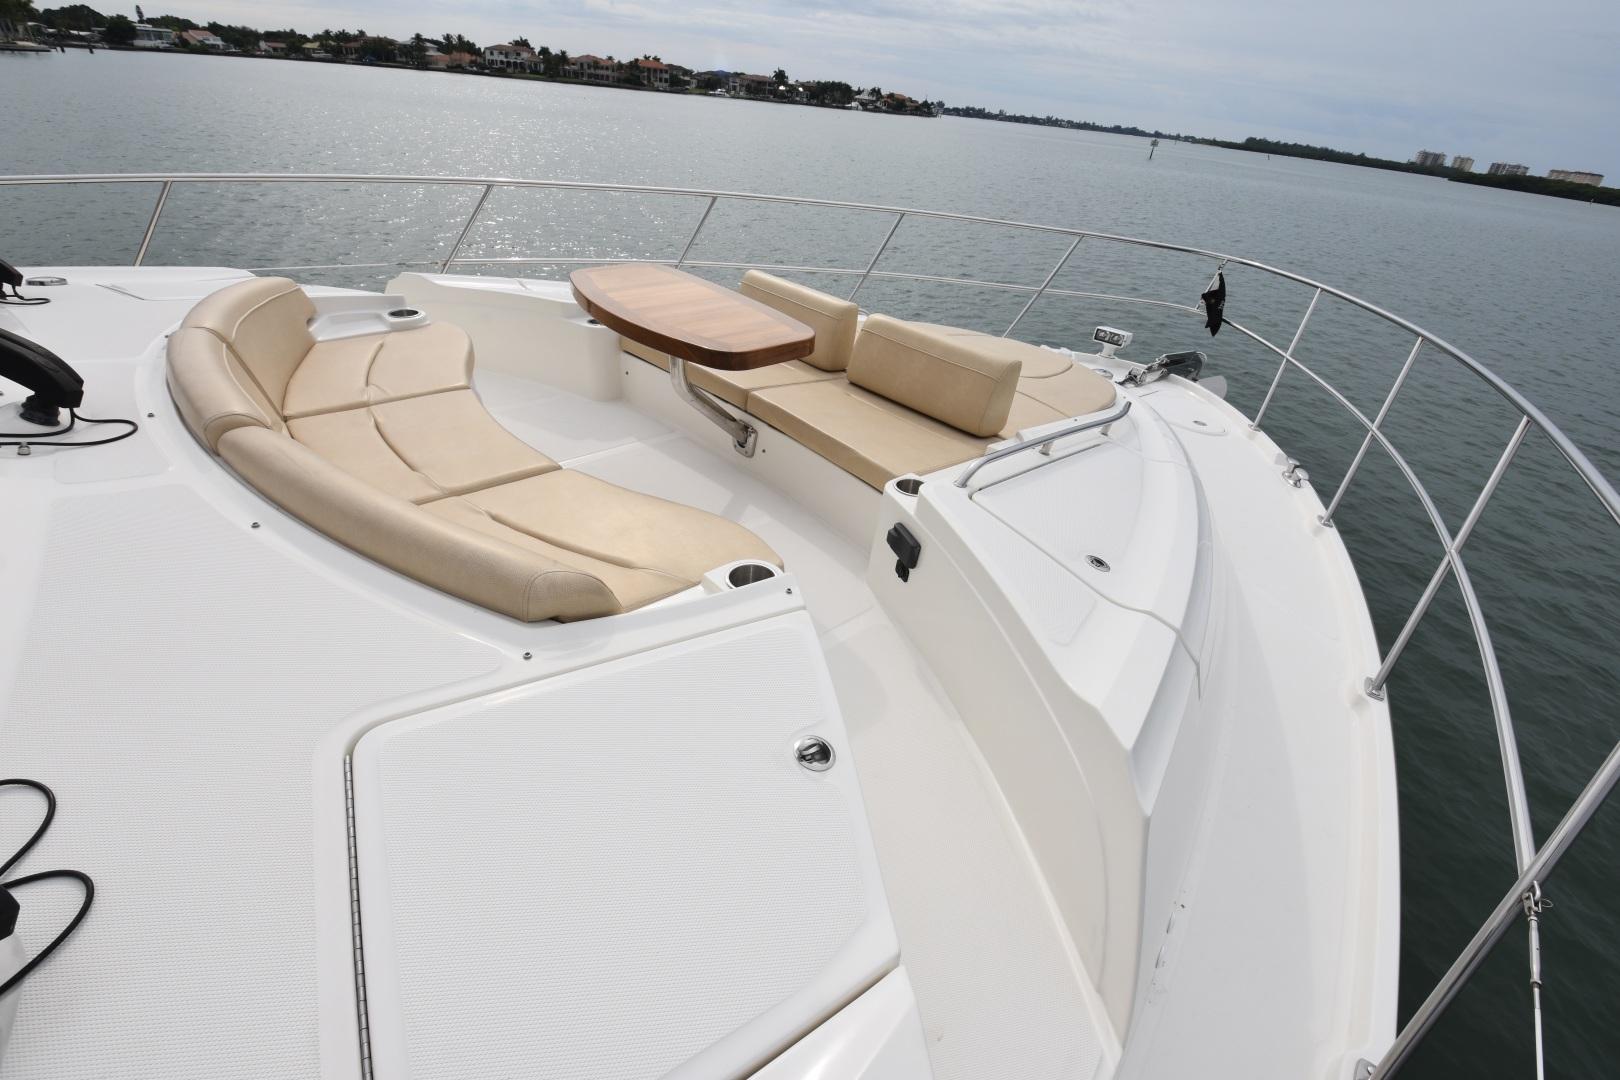 Sea Ray-L650 2016-3x's the Charm Longboat Key-Florida-United States-2016 Sea Ray L650  3x's the Charm  Bow Seating-1251859 | Thumbnail